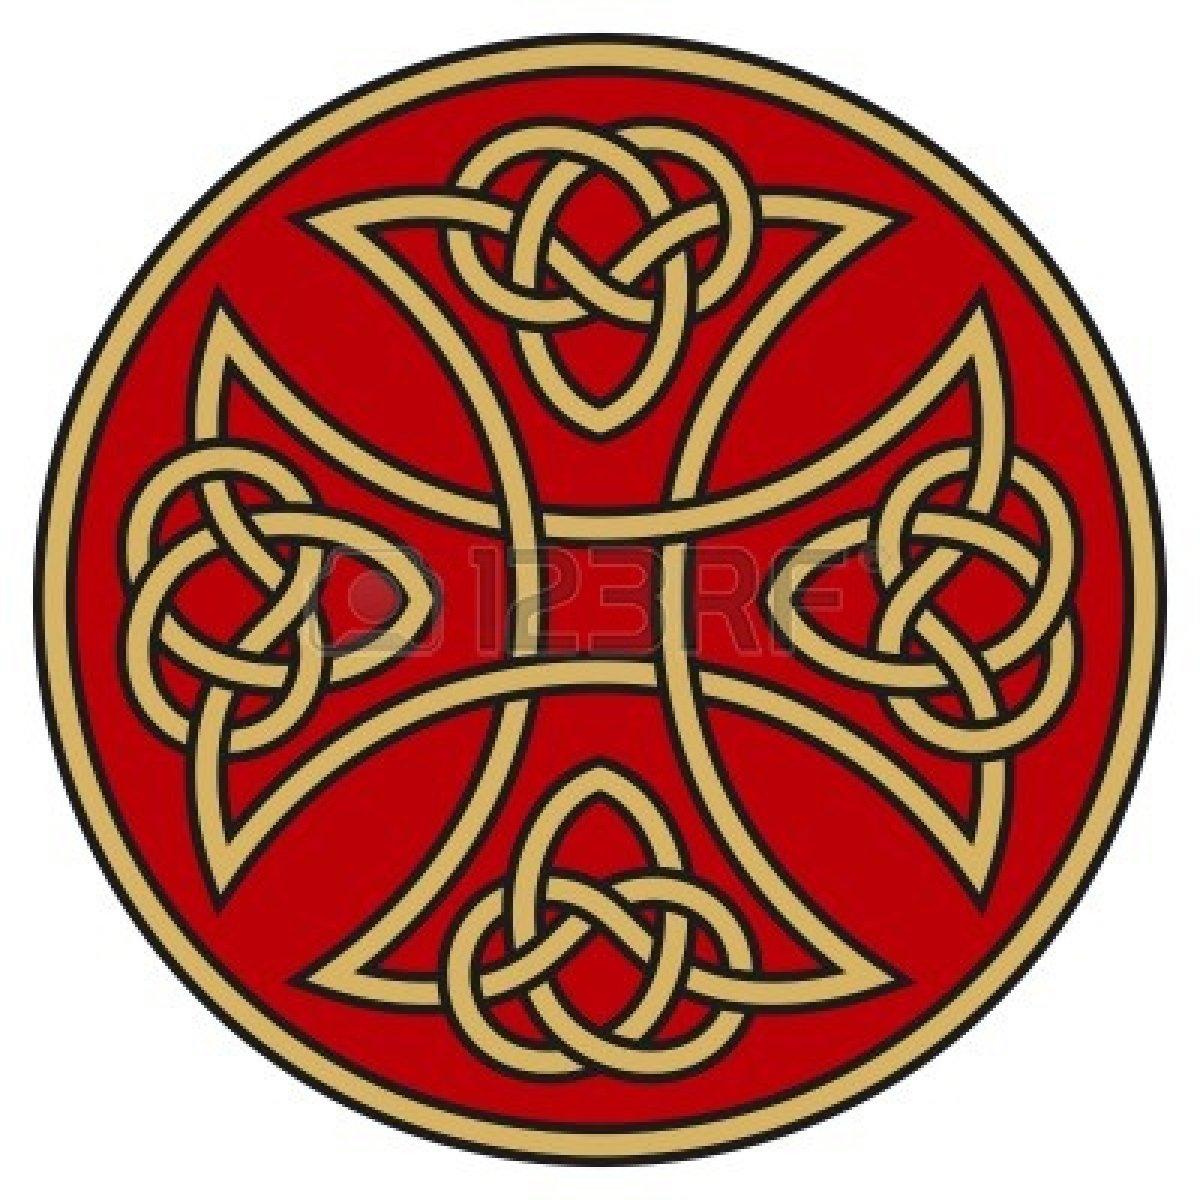 black celtic cross clip art clipart panda free clipart celtic cross clipart black and white celtic cross image clipart